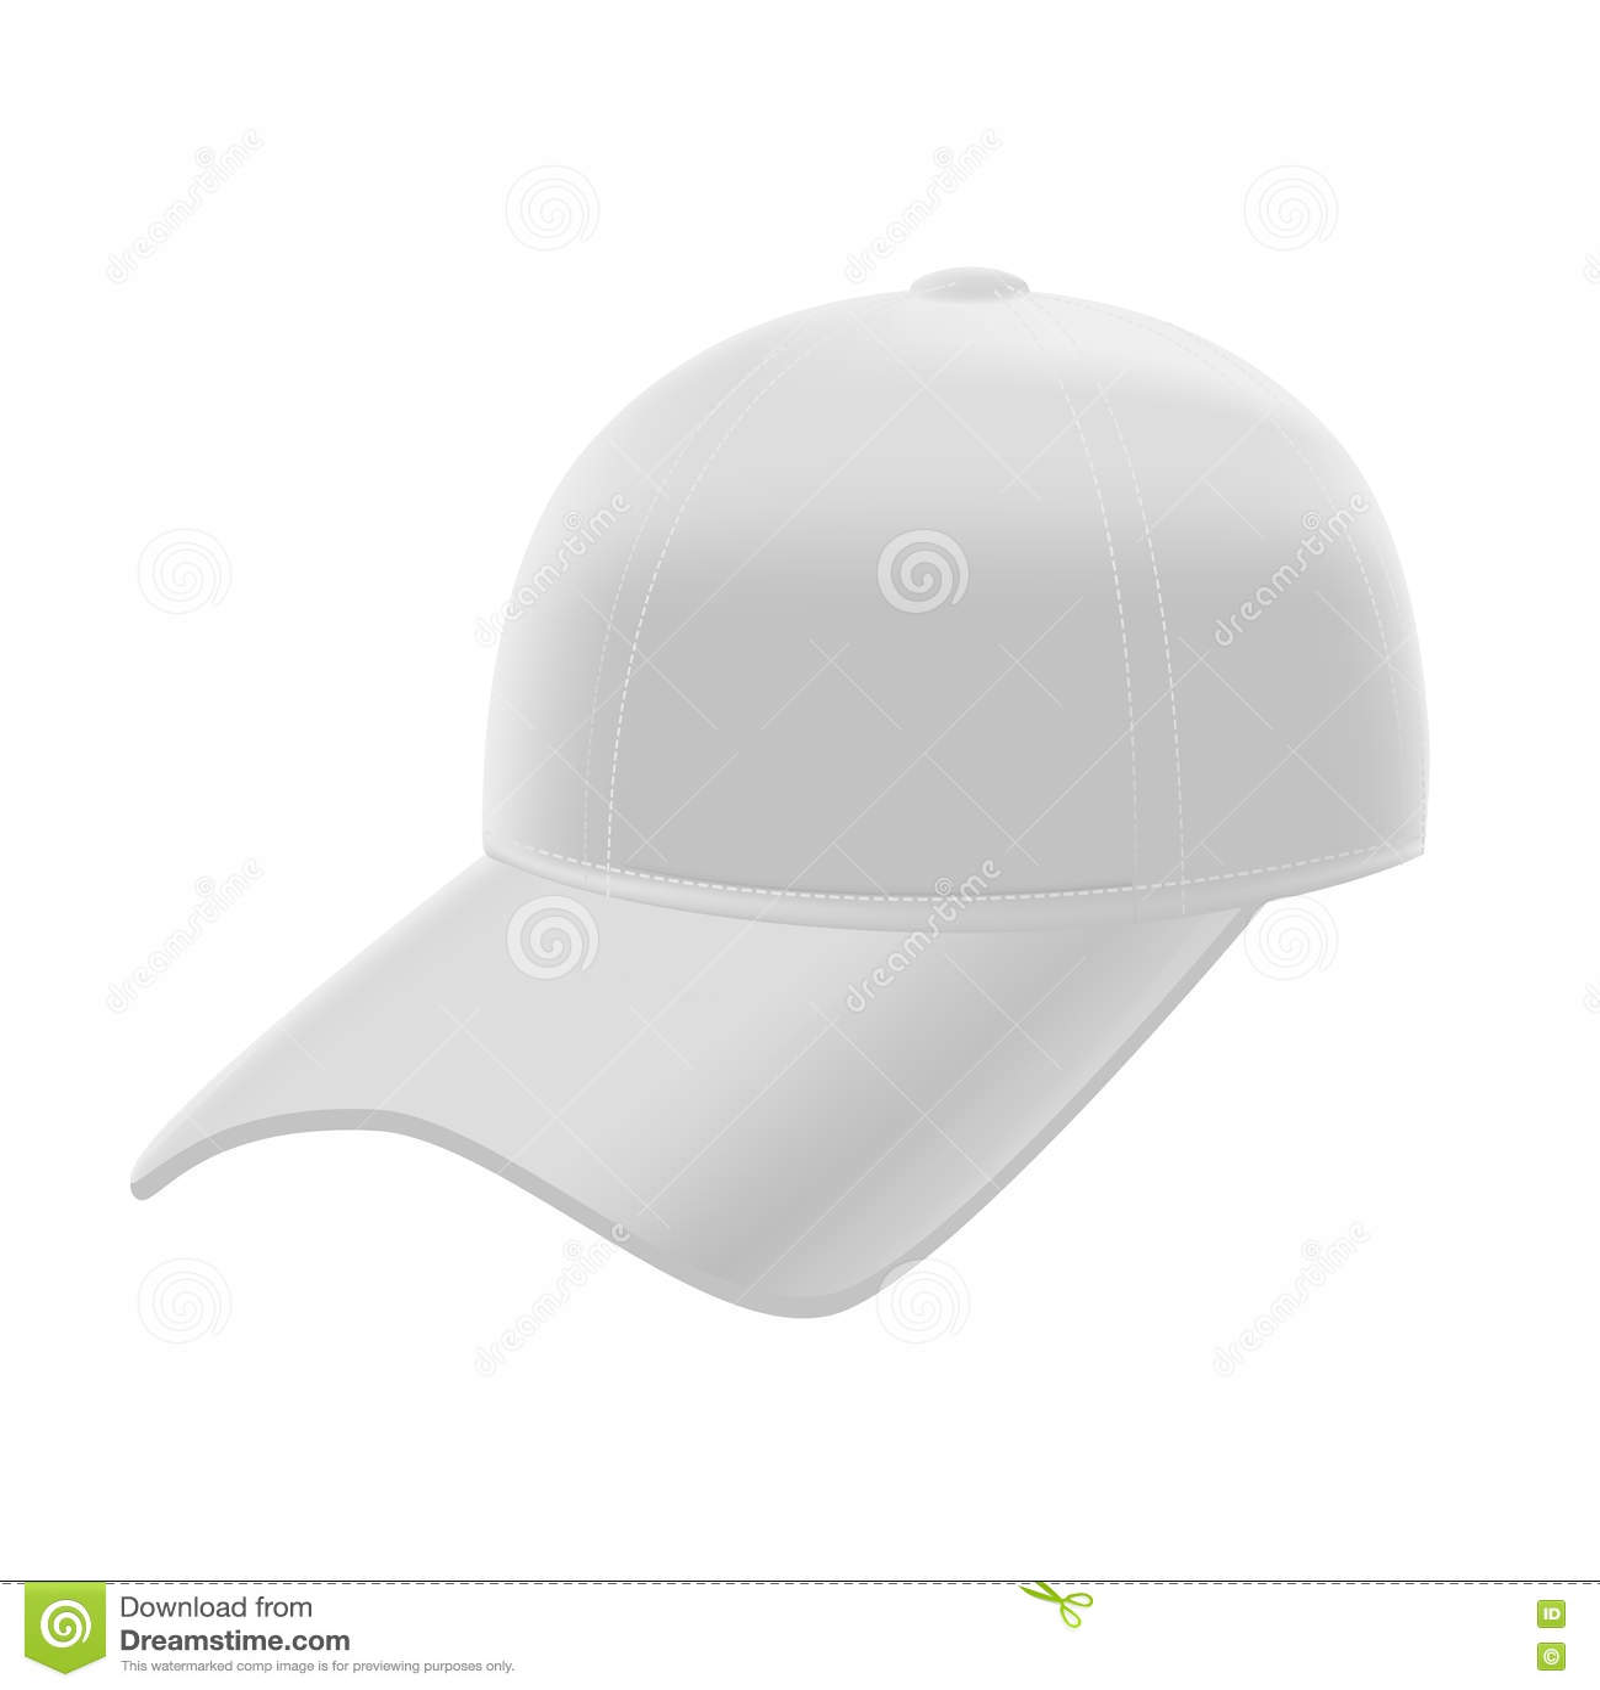 5755f8ee6f Modelo Branco Realístico Do Molde Do Boné De Beisebol Vetor ...